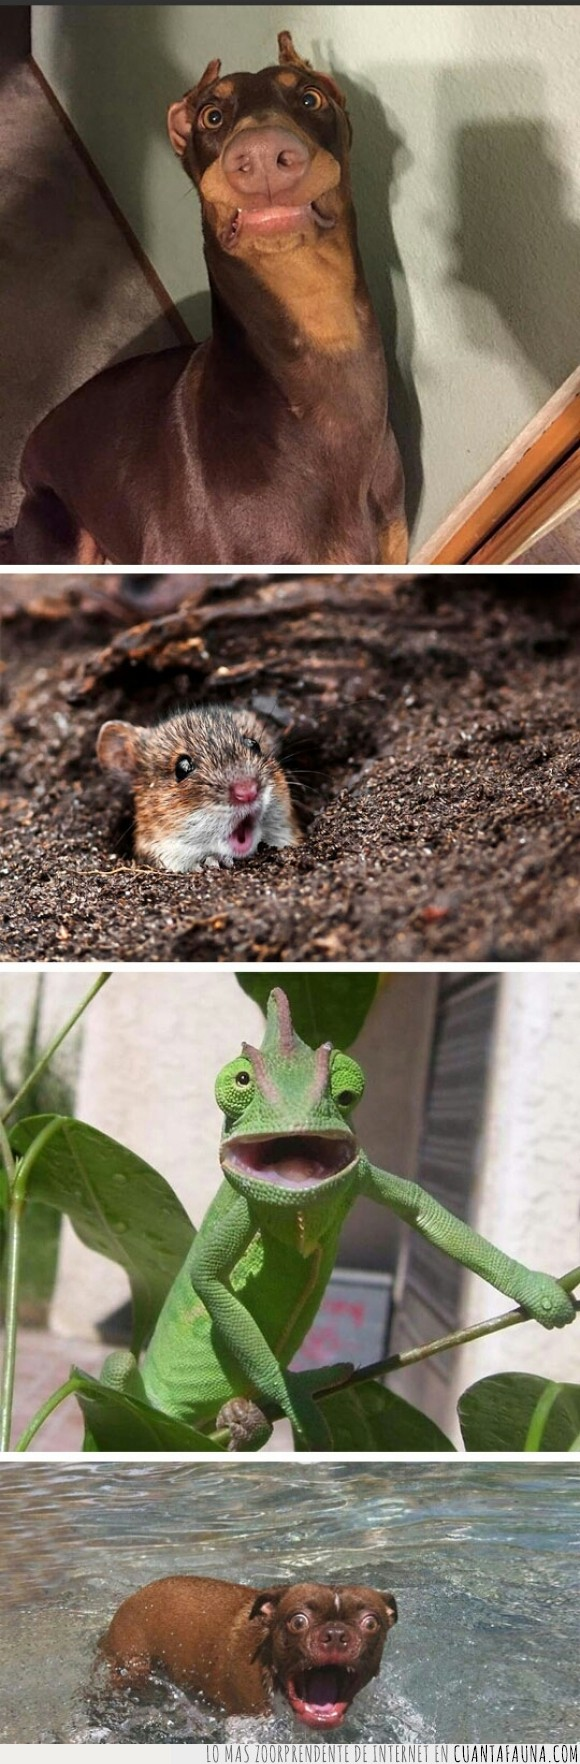 Animales,camaleon,hamster,humor,impresionado,perro,perros,stock